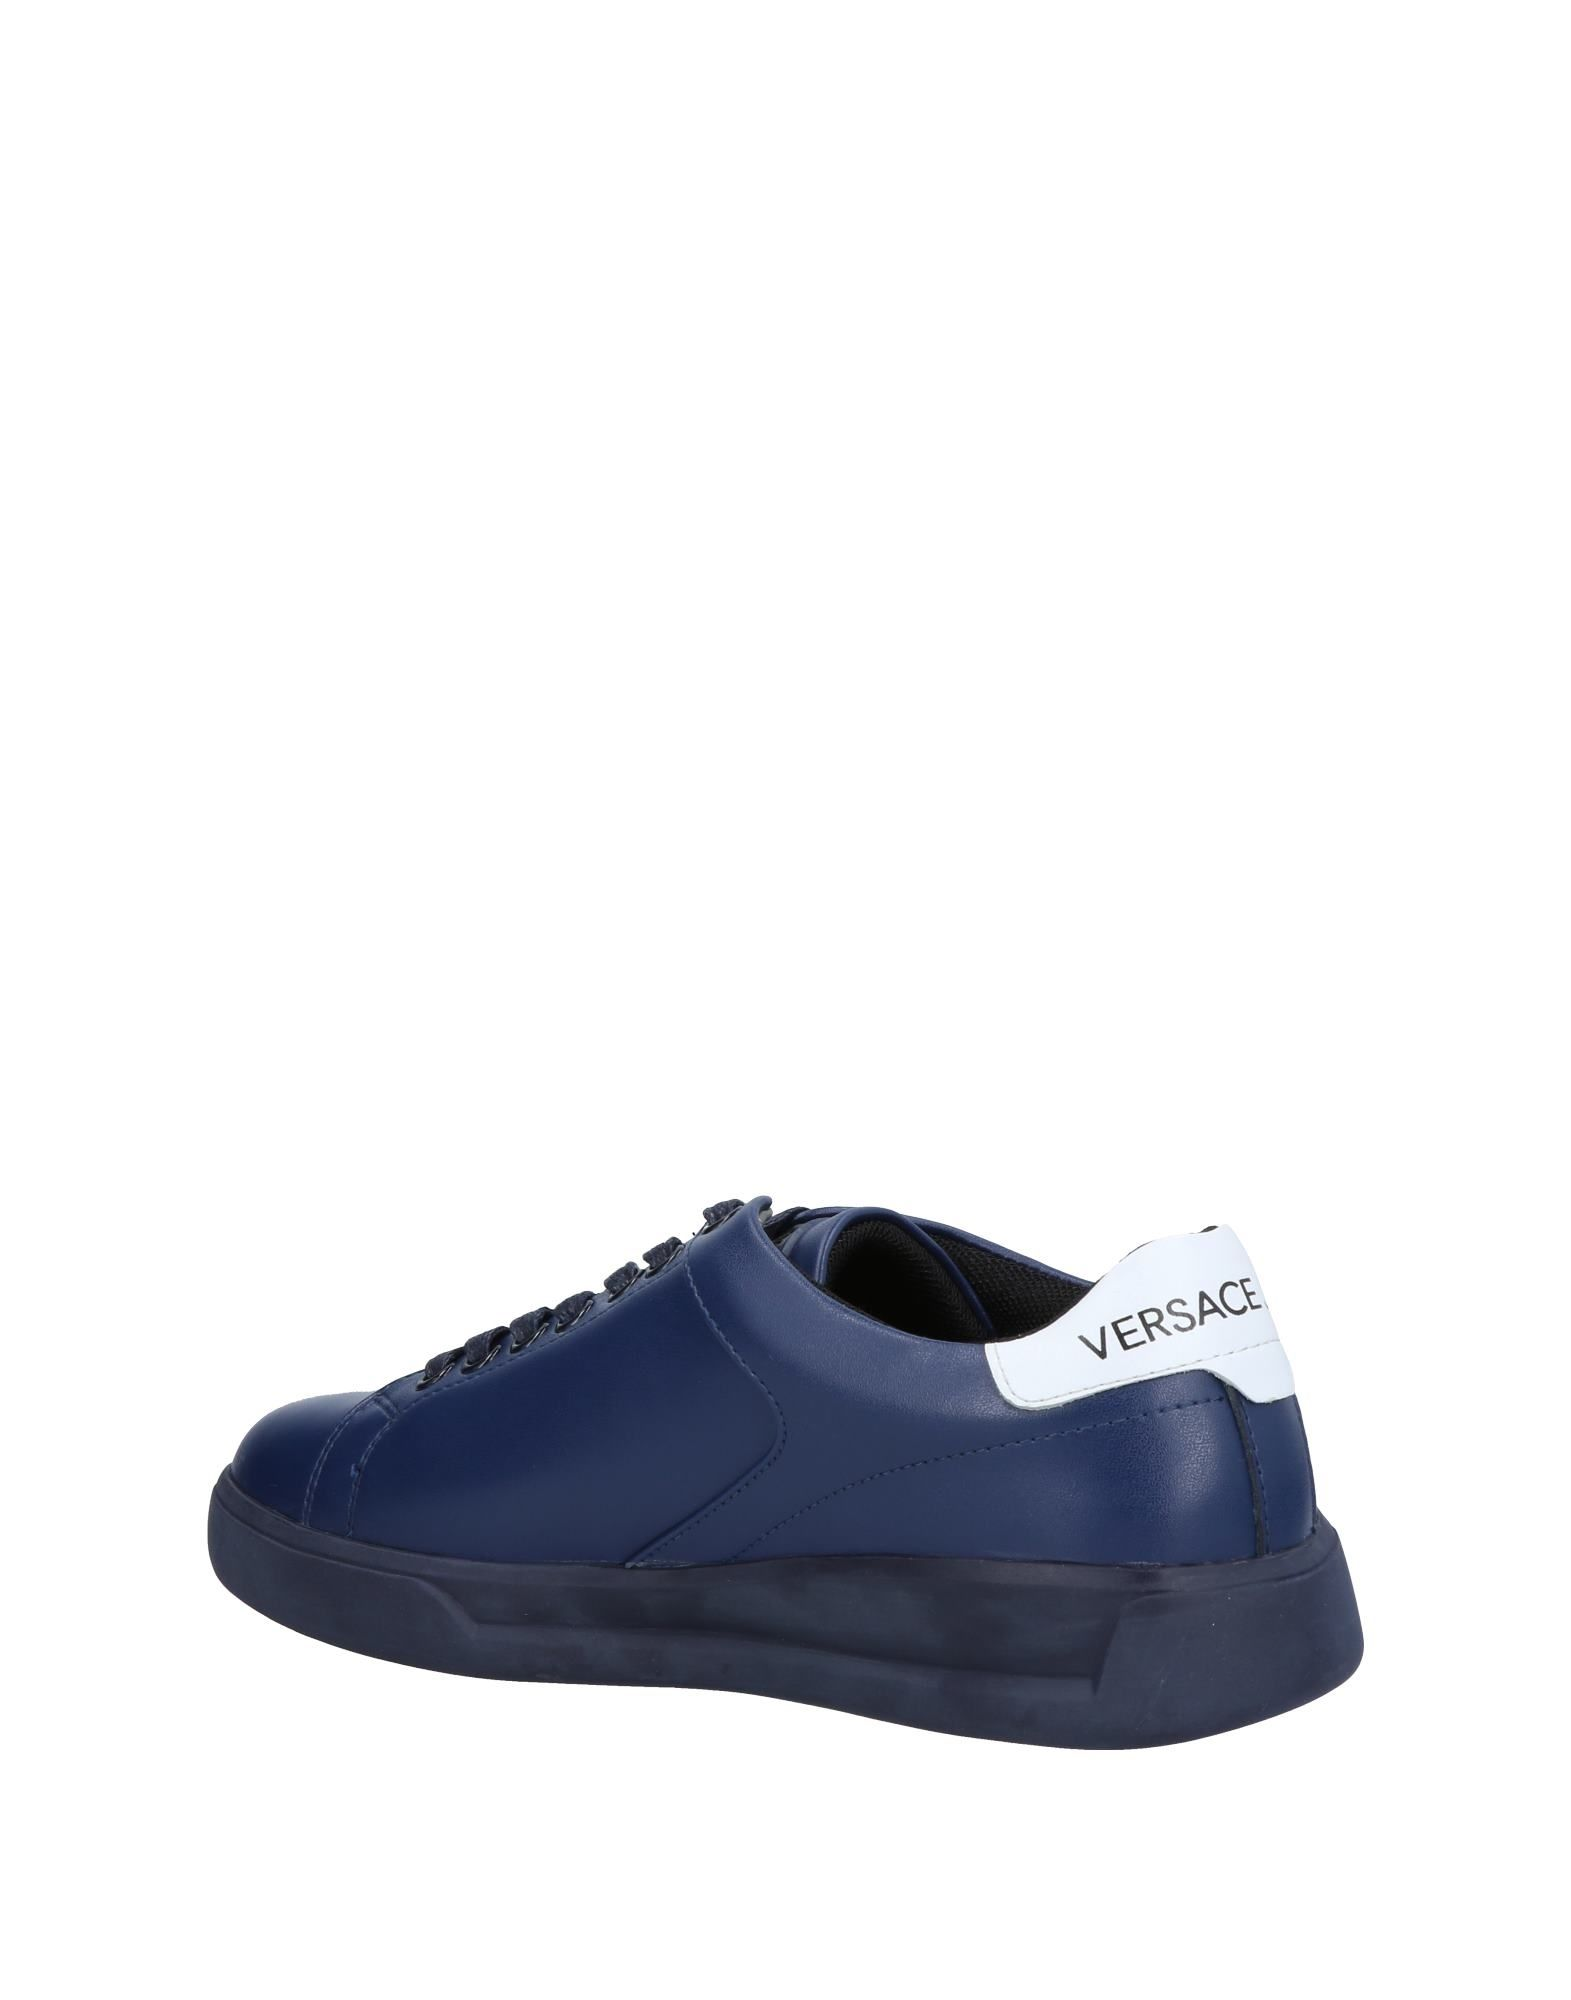 Rabatt echte Schuhe Versace Jeans 11463350EH Turnschuhes Herren 11463350EH Jeans afa681